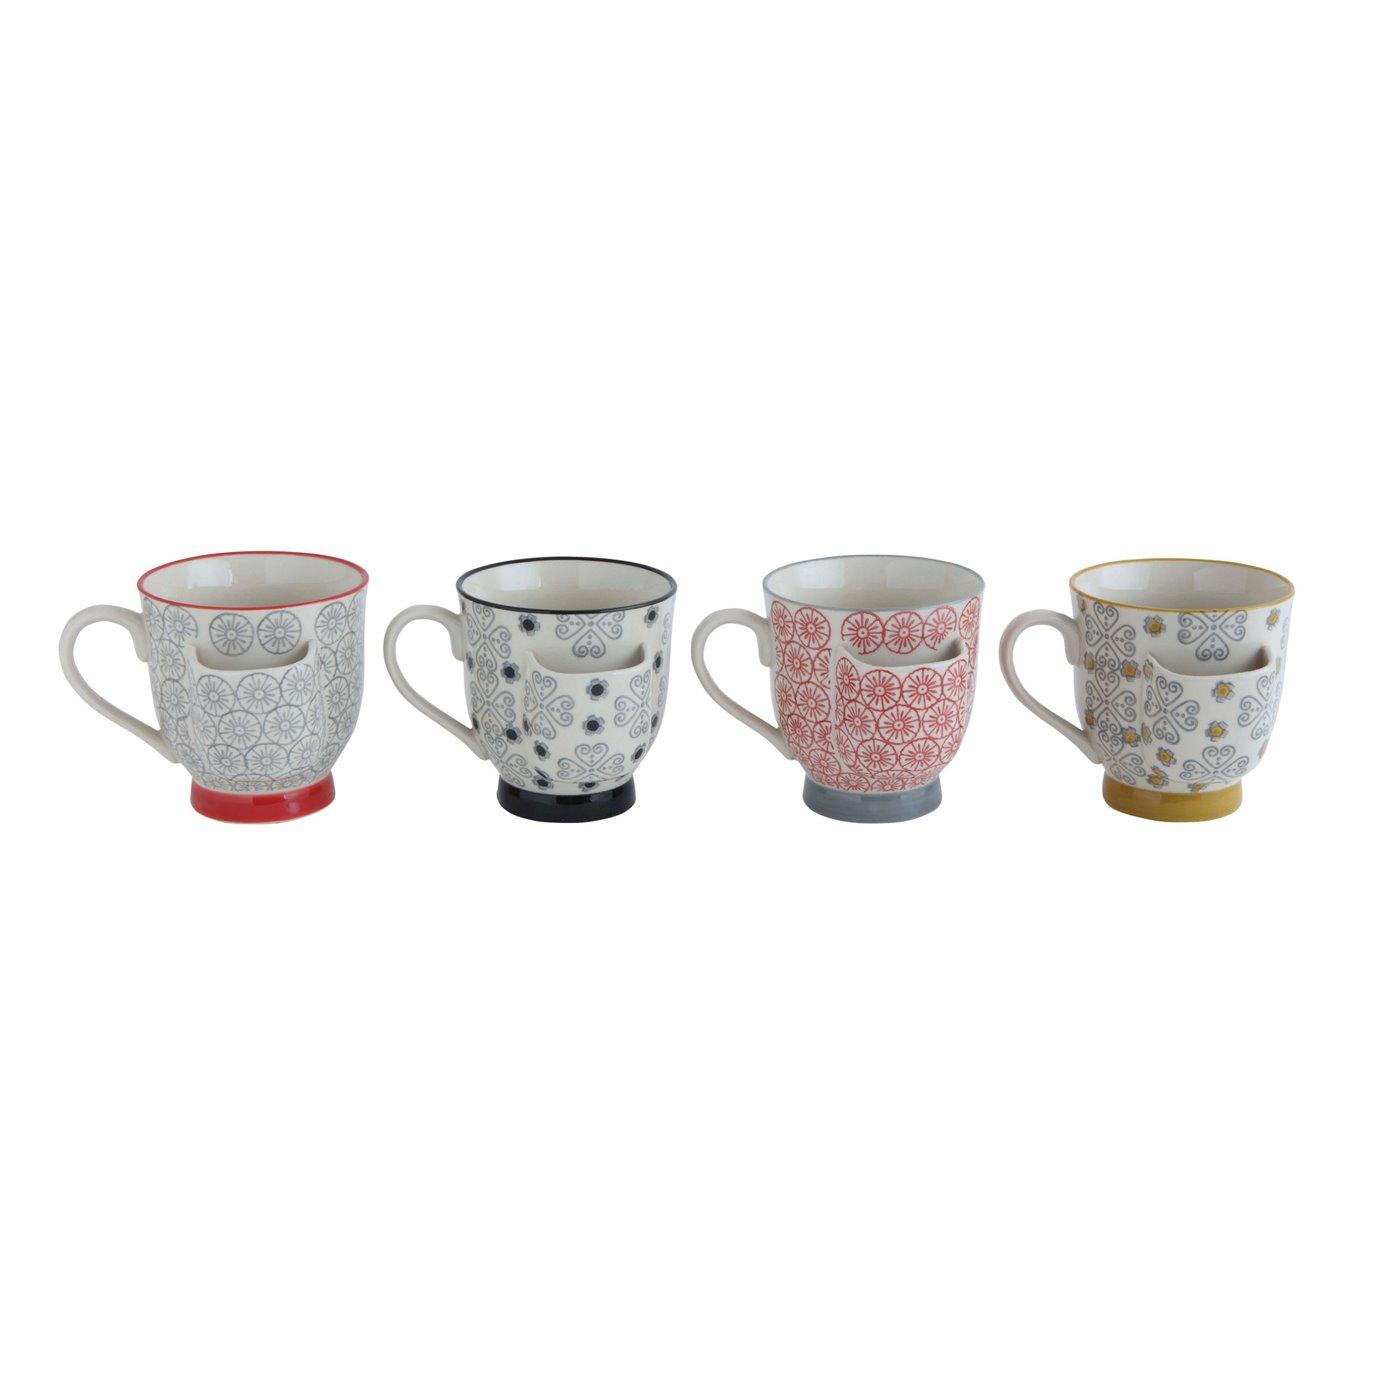 Decorative Stoneware Mugs with Tea Bag Holders (Set of 4 Designs)